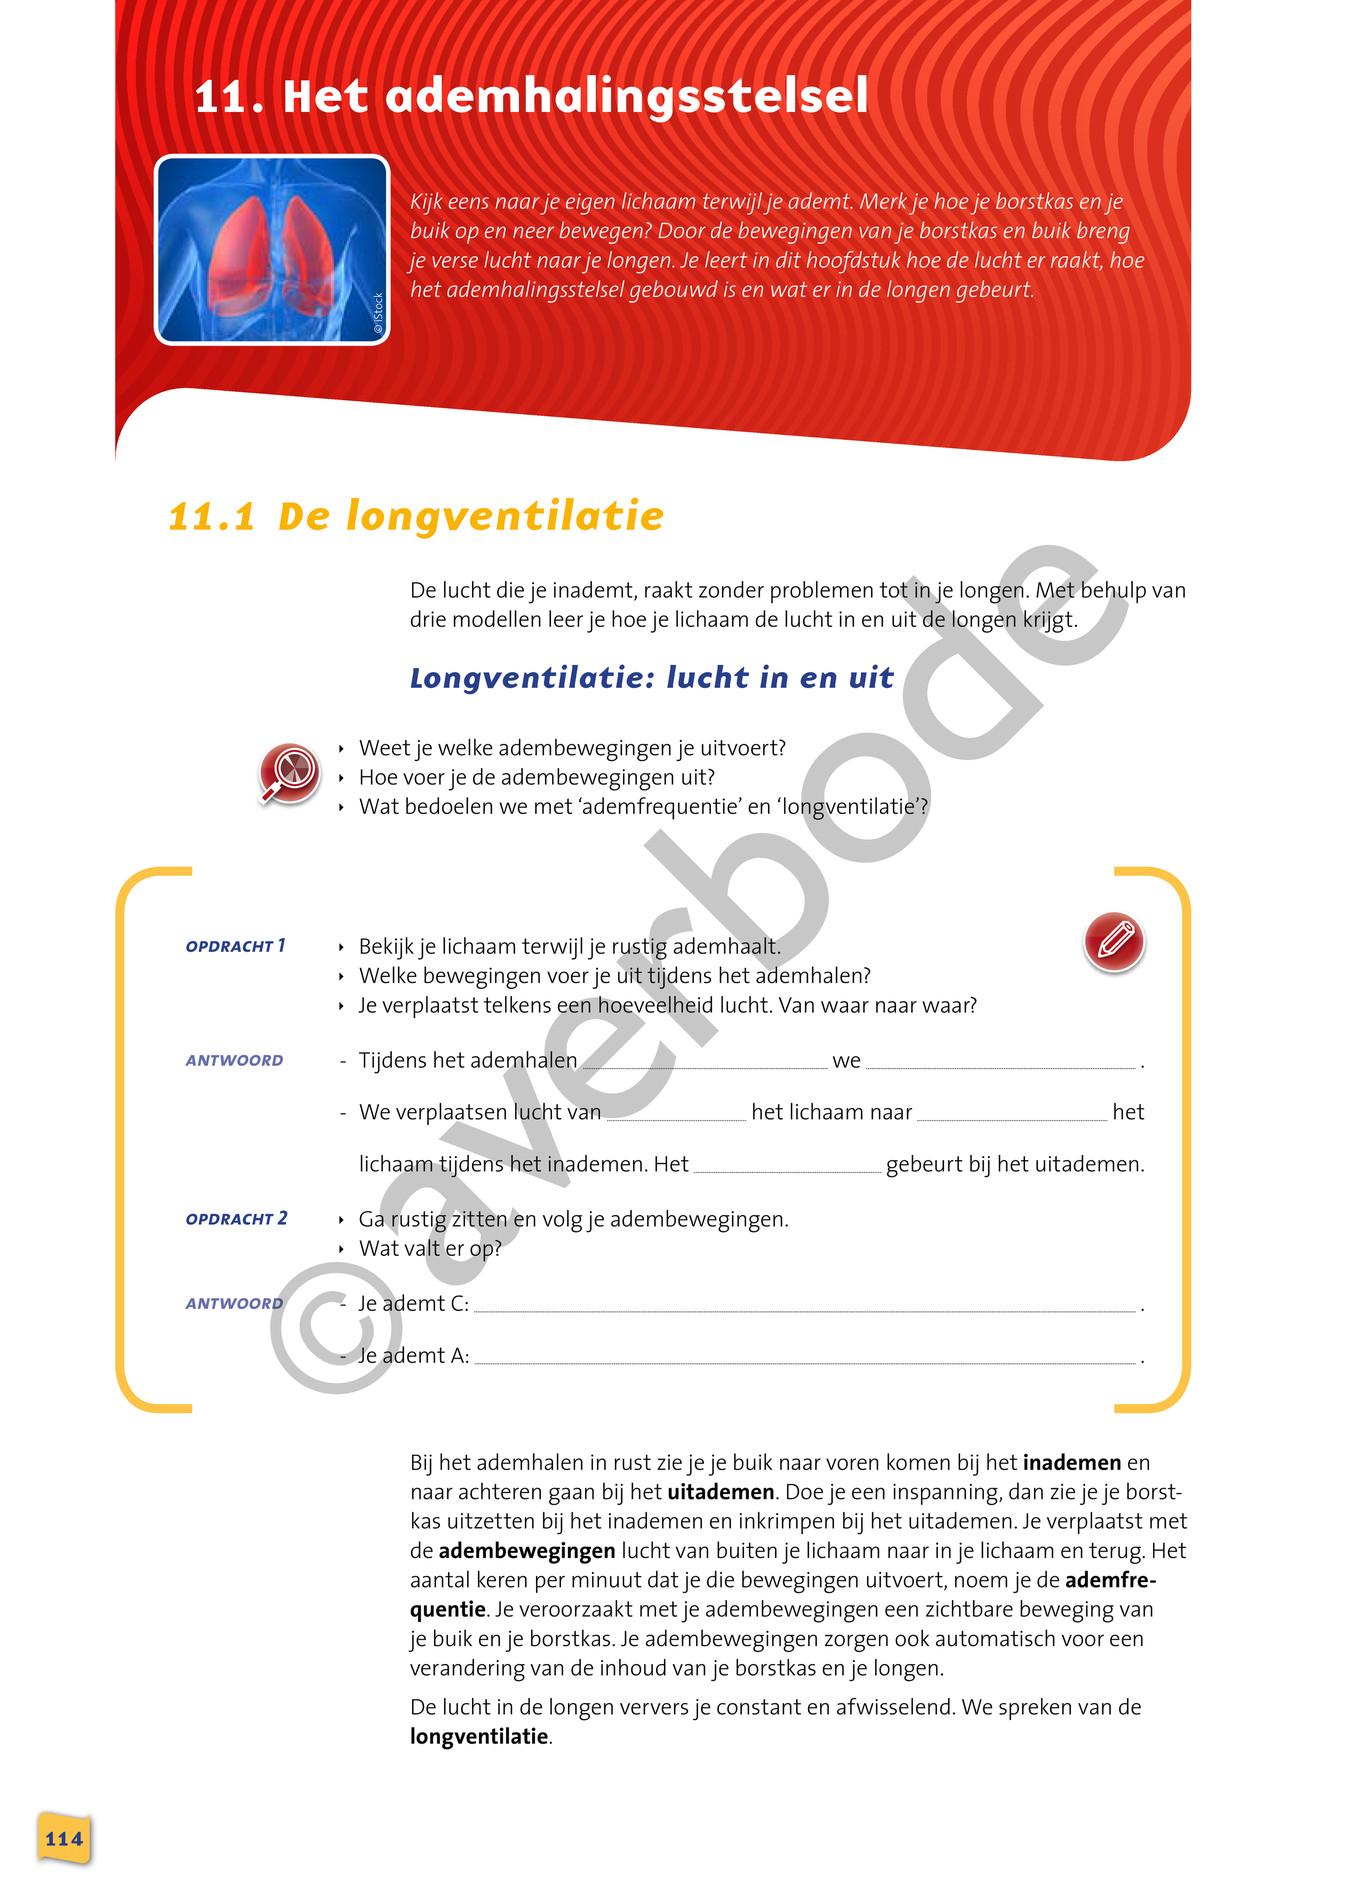 Averbode - Zuurstof 1: WB (selectie) - Pagina 16-17: https://view.publitas.com/averbode/zuurstof-1-wb-selectie/page/16-17